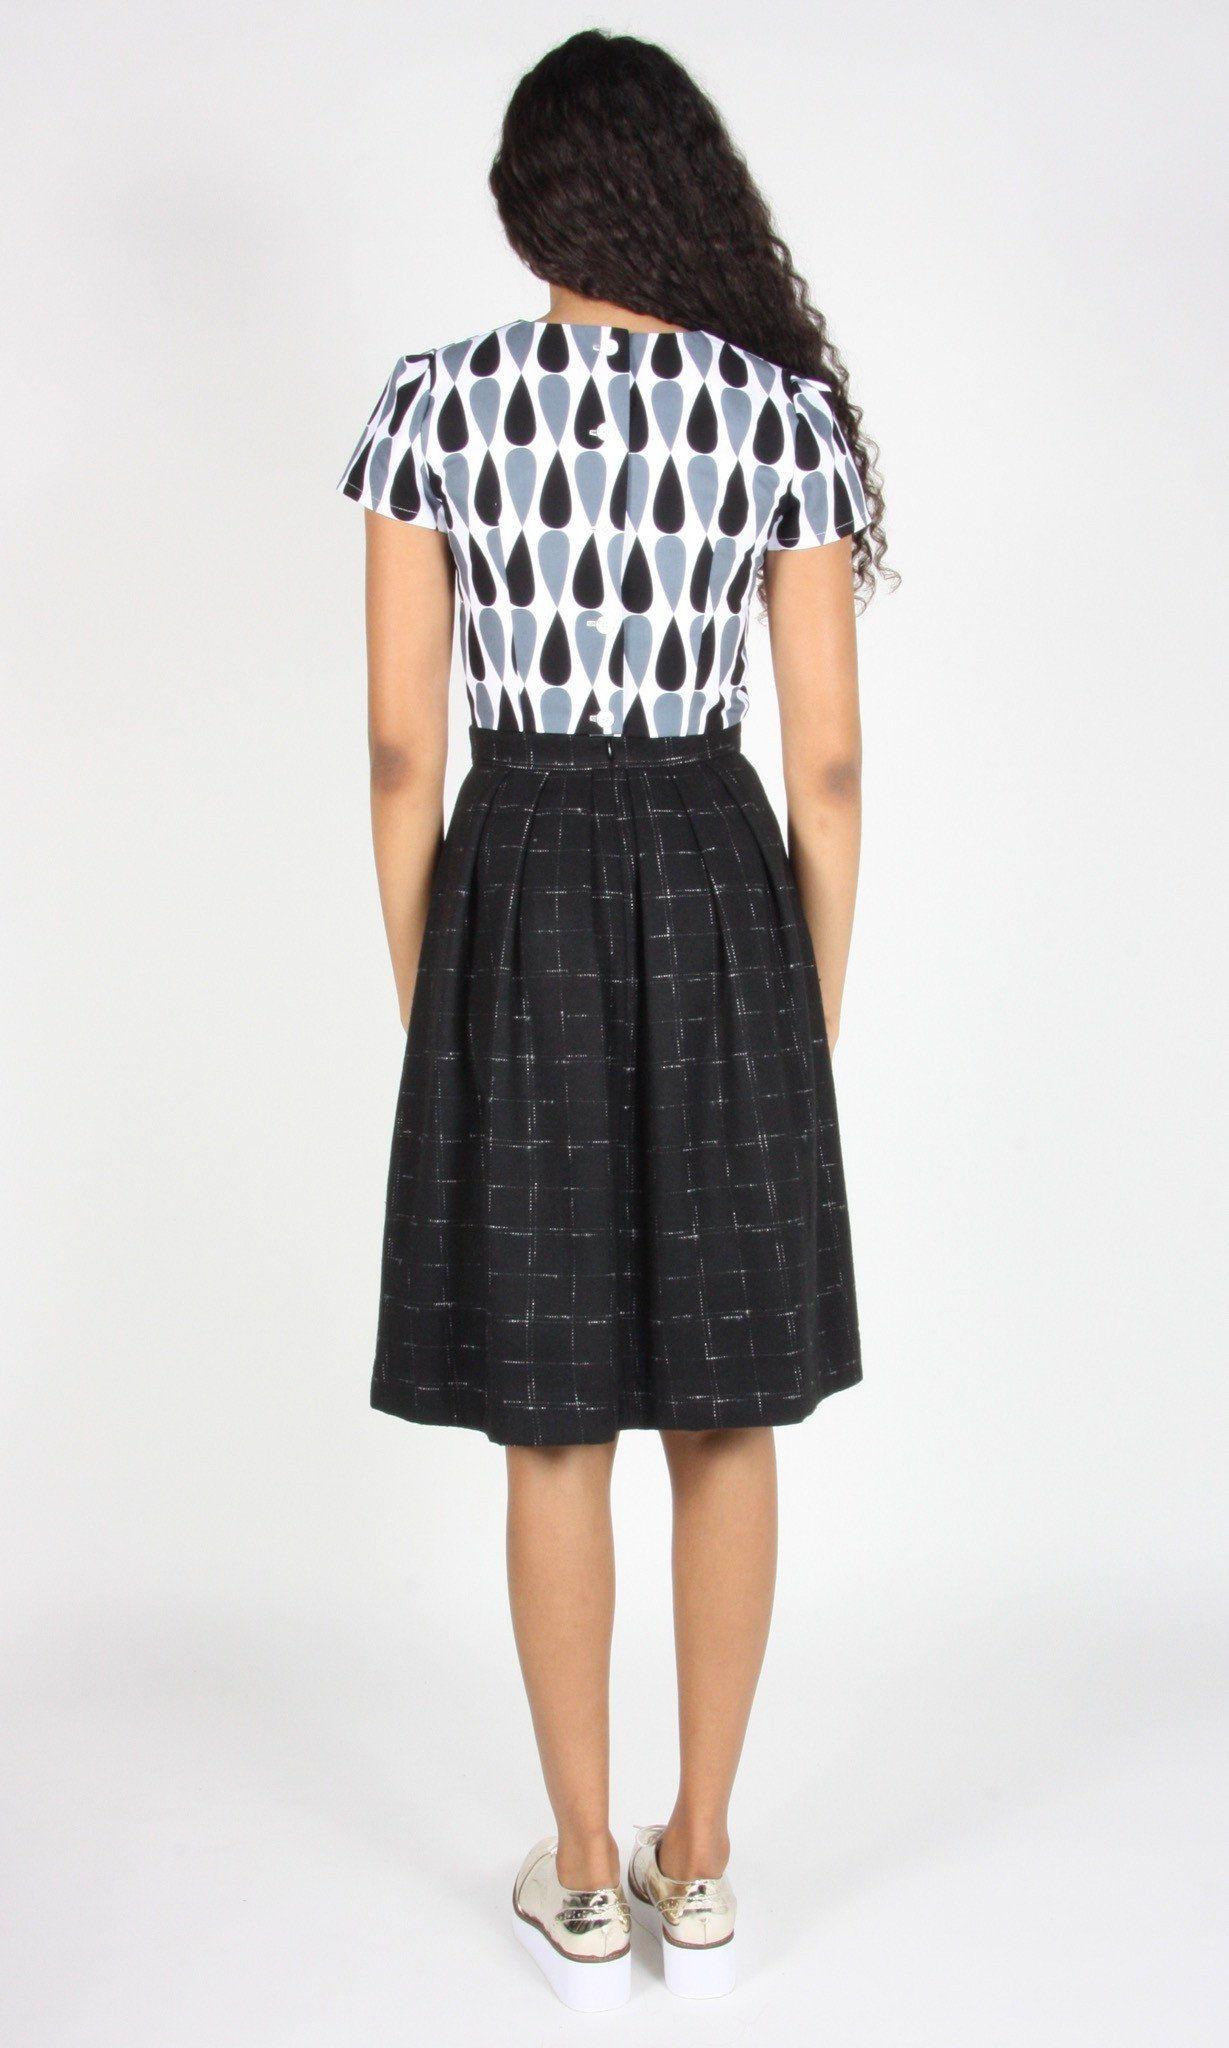 Flannel homecoming dress  Amazon Skirt  Black  Clothes Wishlist  Pinterest  Flannels